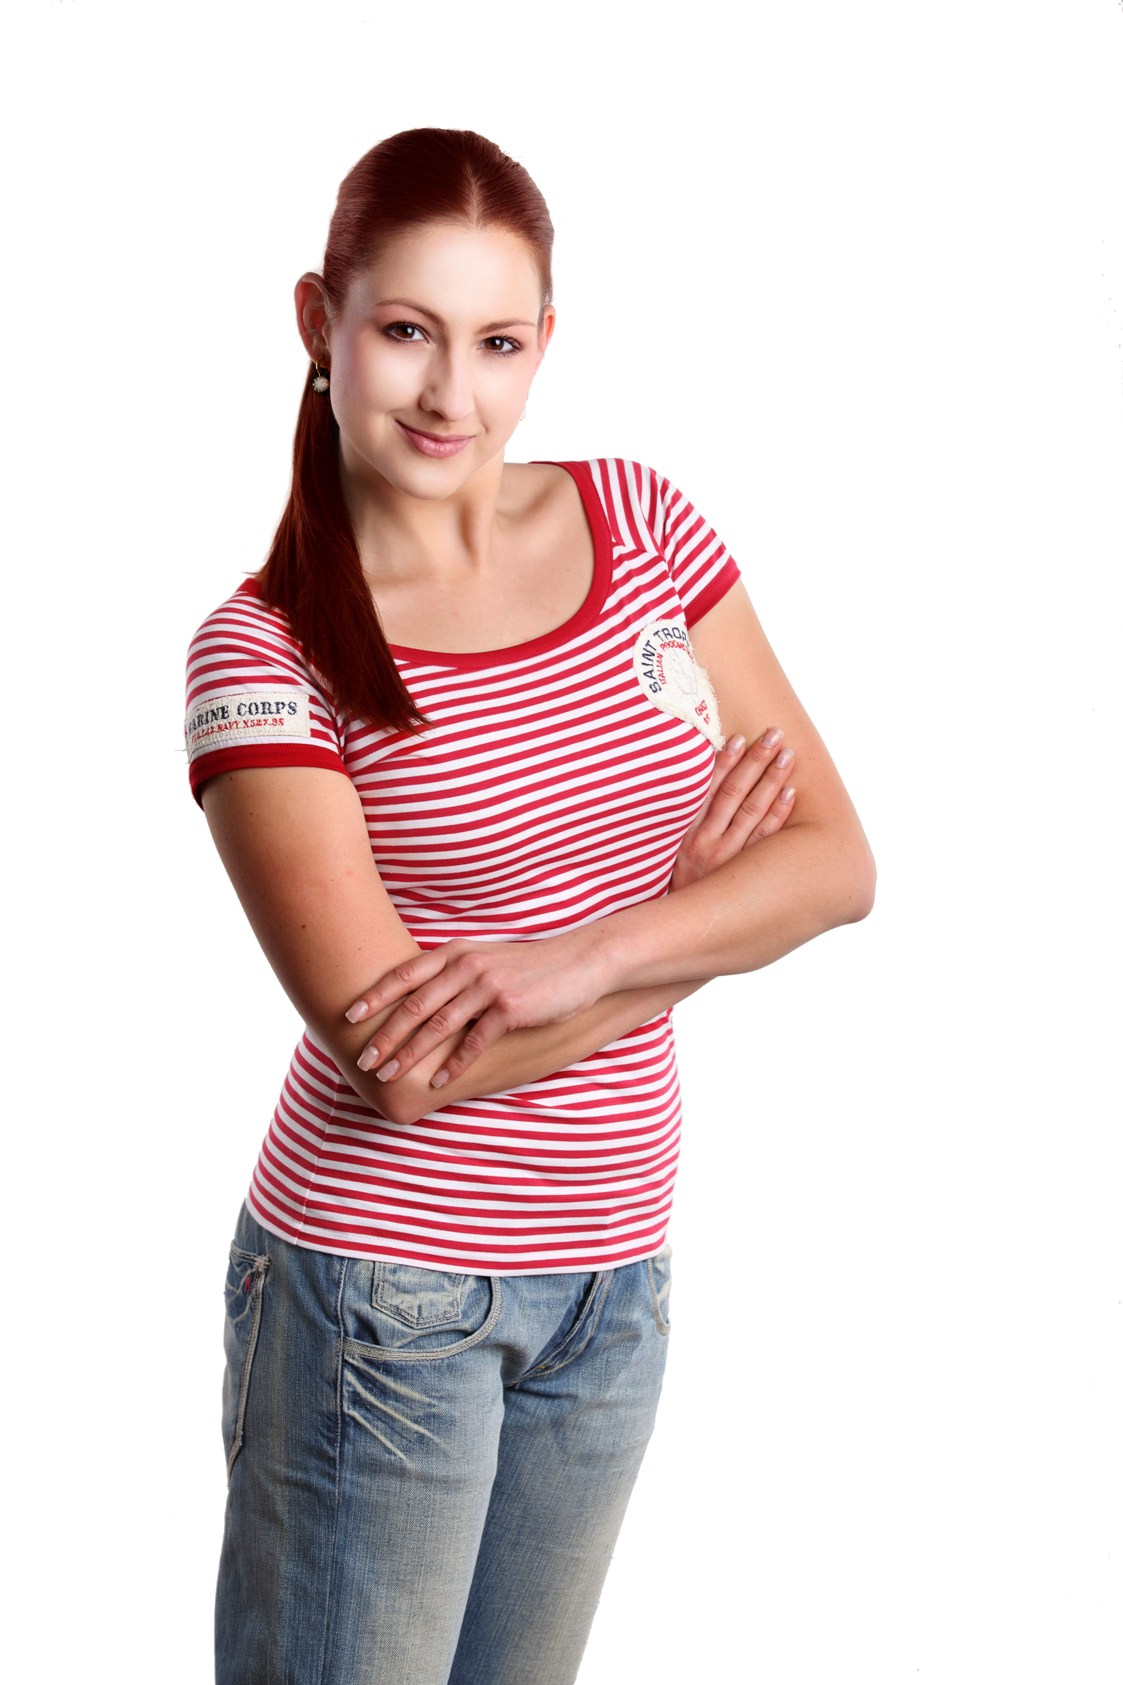 Námořnické tričko RedBerry s krátkým rukávem